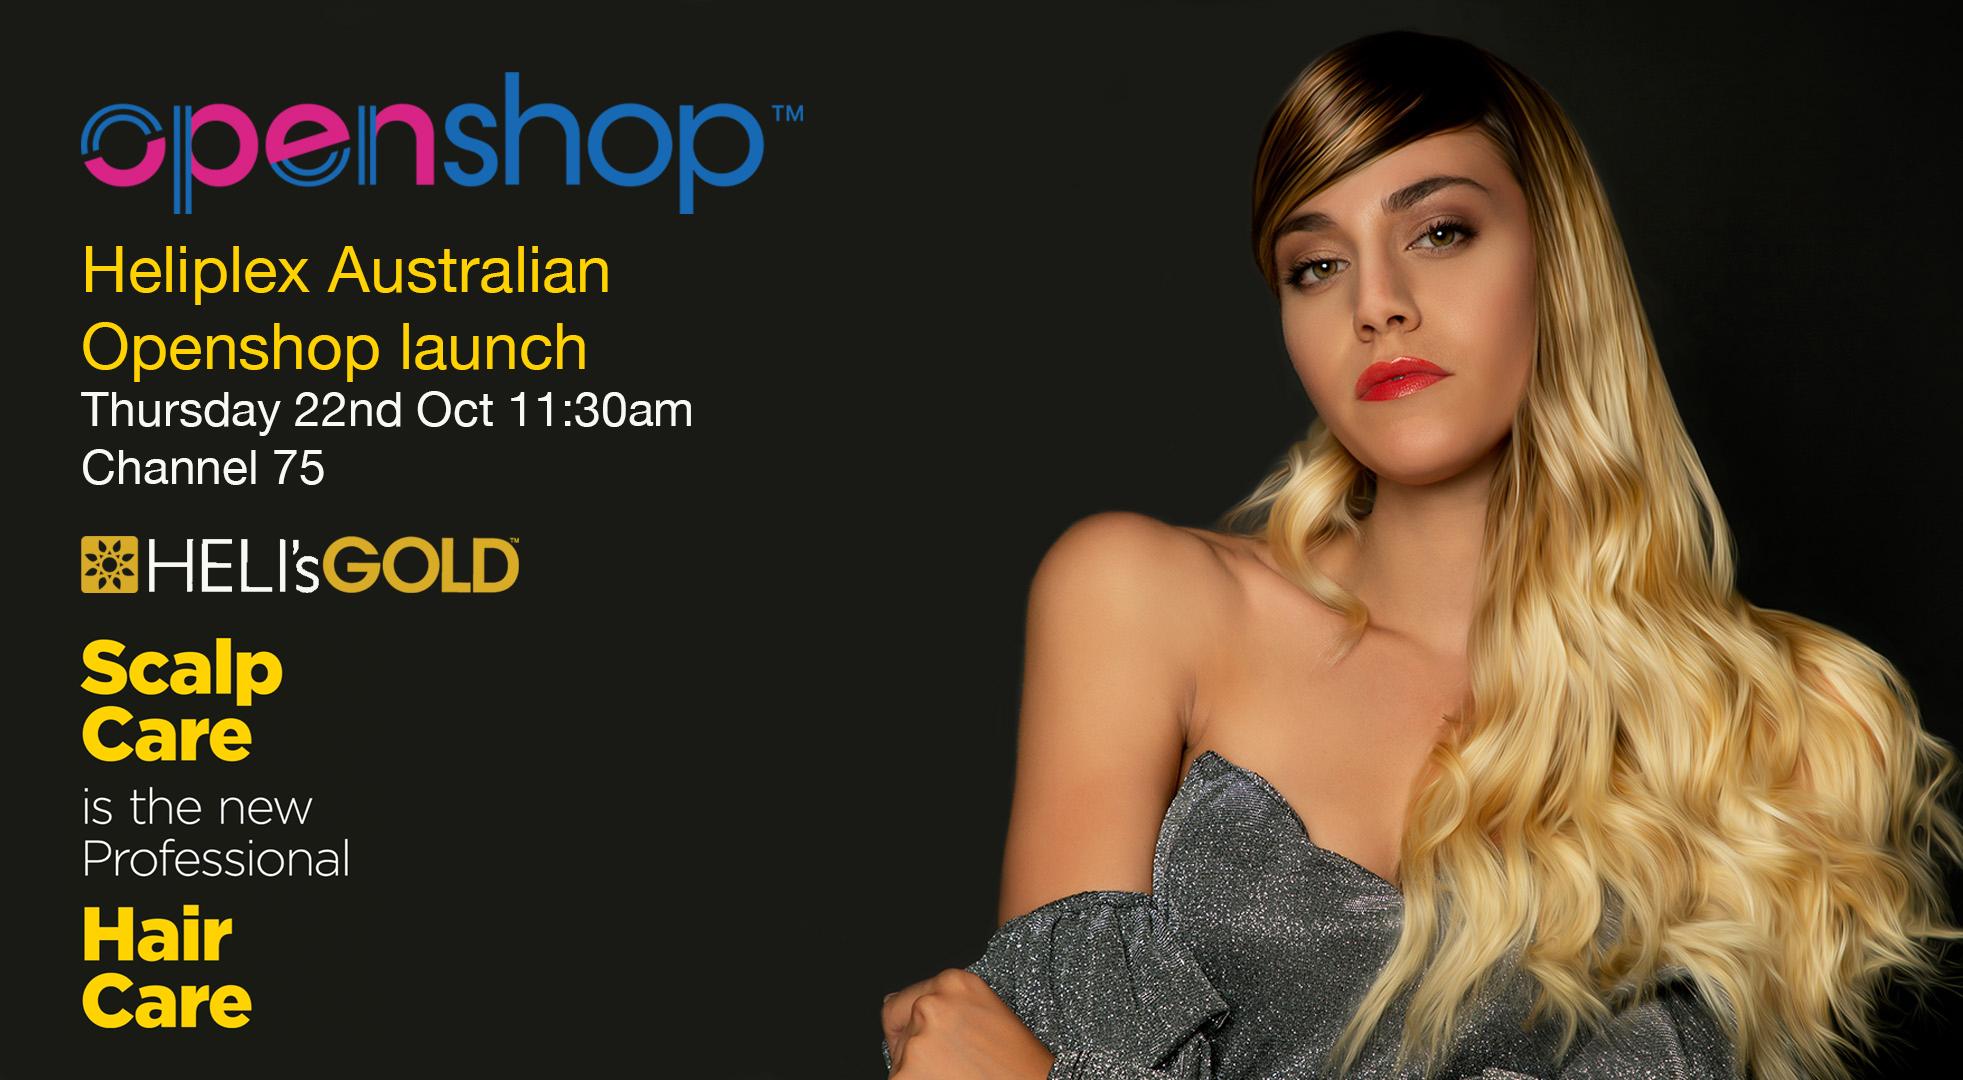 Australian TV launch for Heliplex on Openshop Channel 75 , Thursday 22nd Oct 11:30am